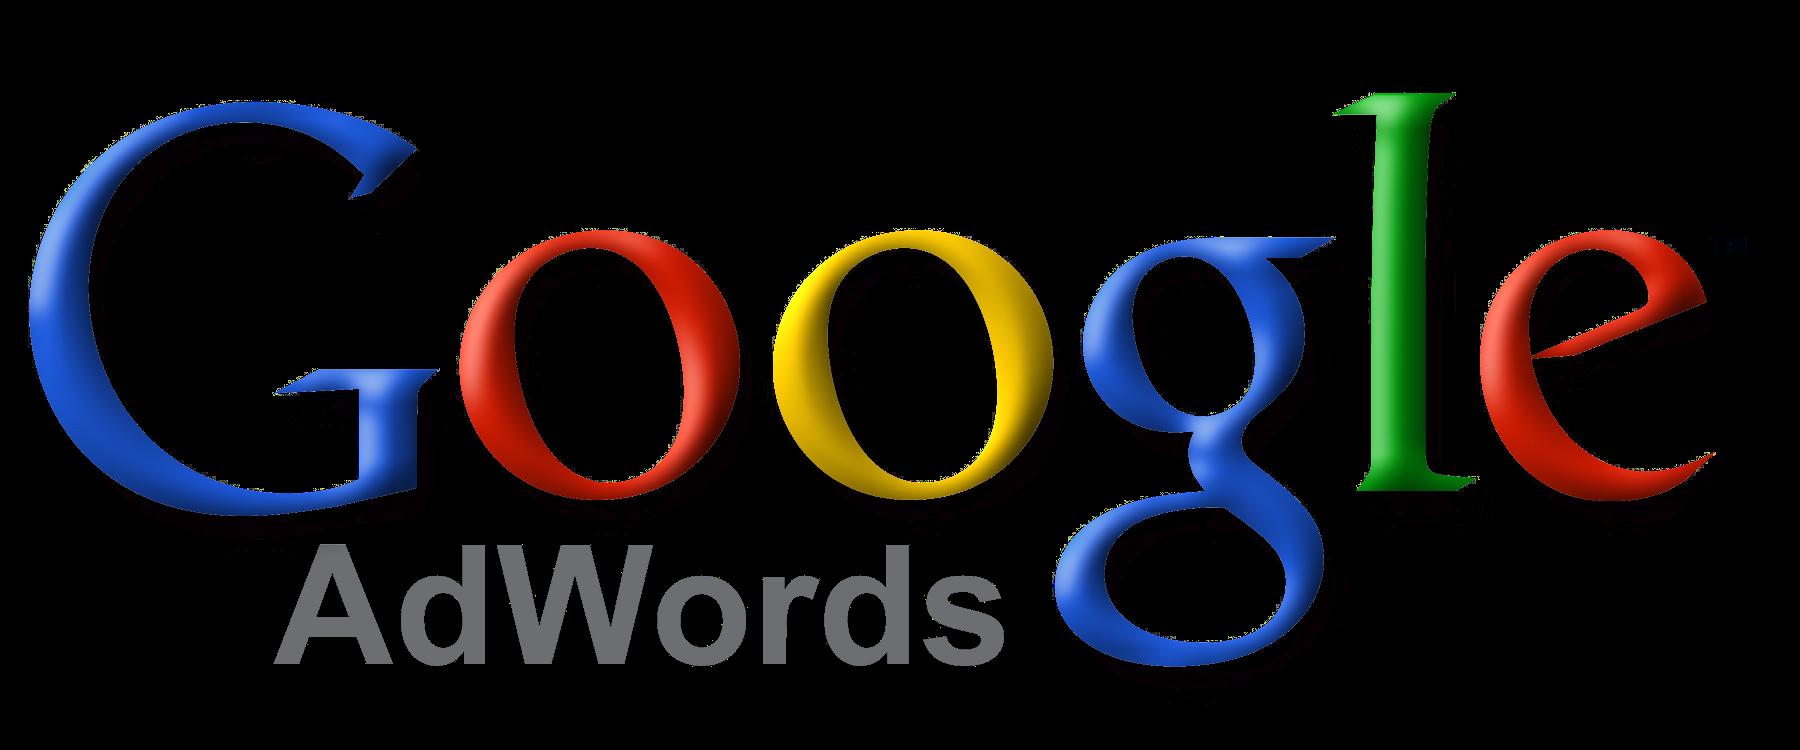 Digital Marketing Google AdWords Hacks